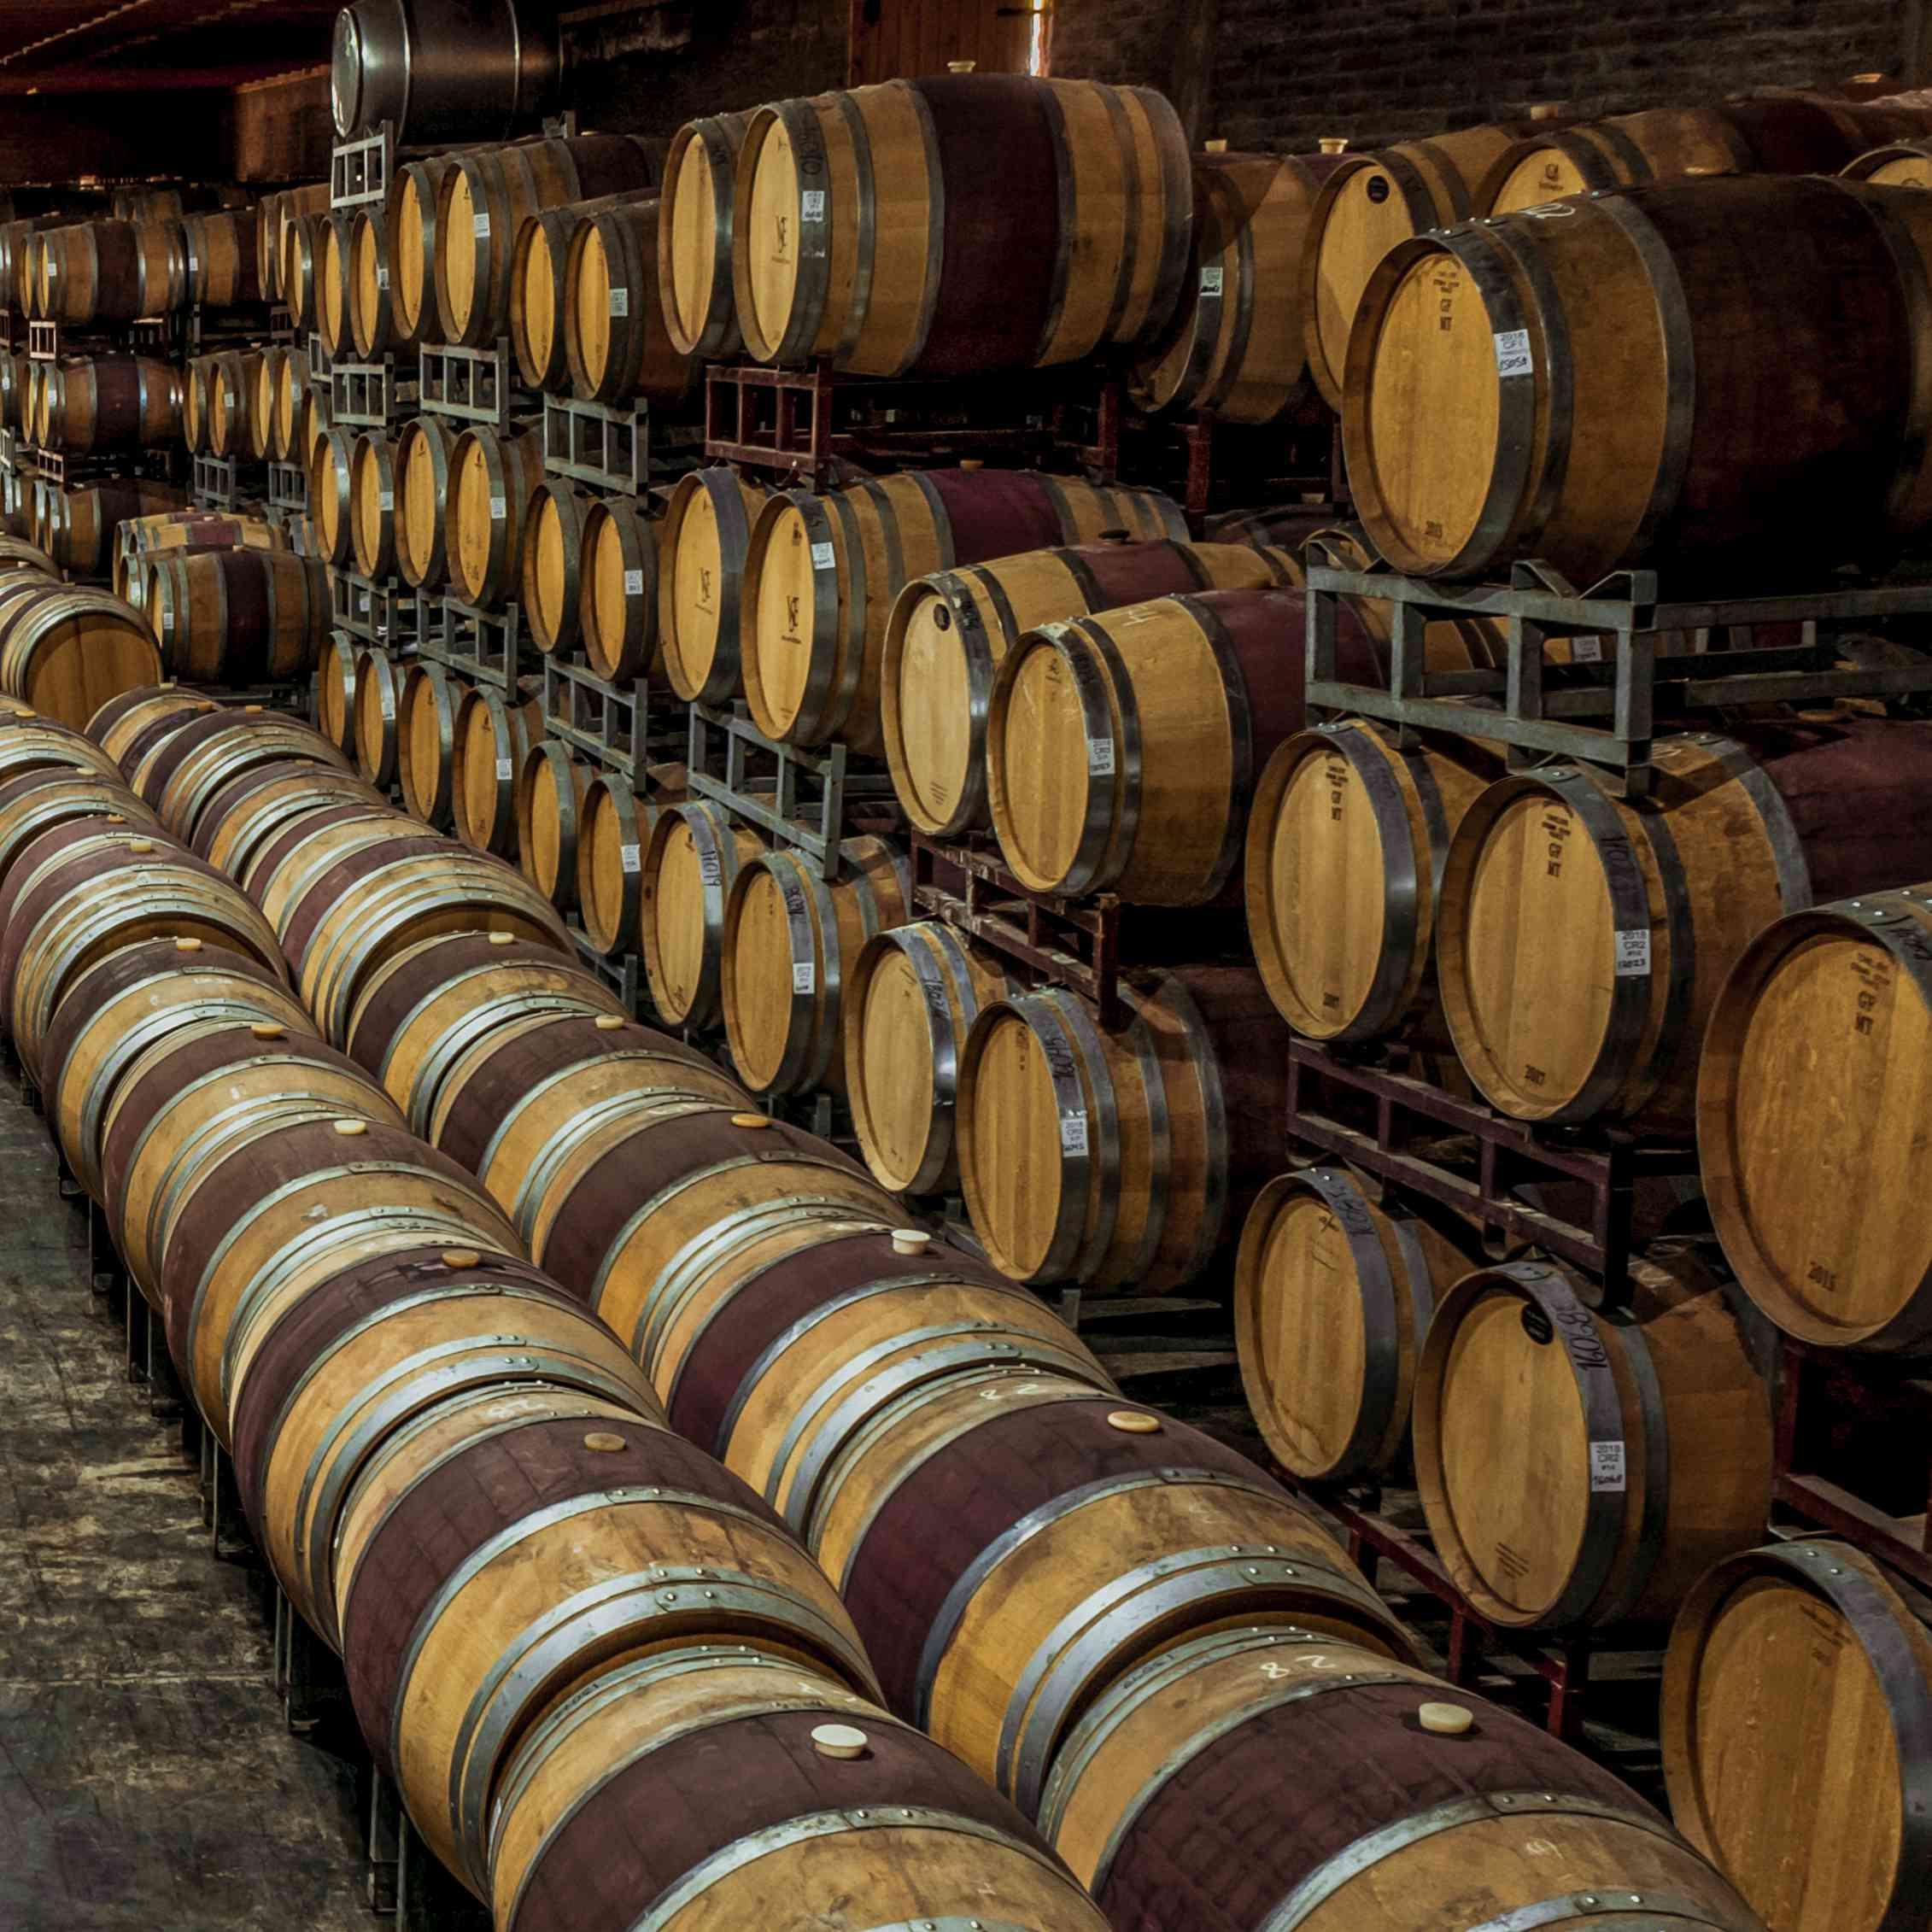 Numerosos barriles de vino